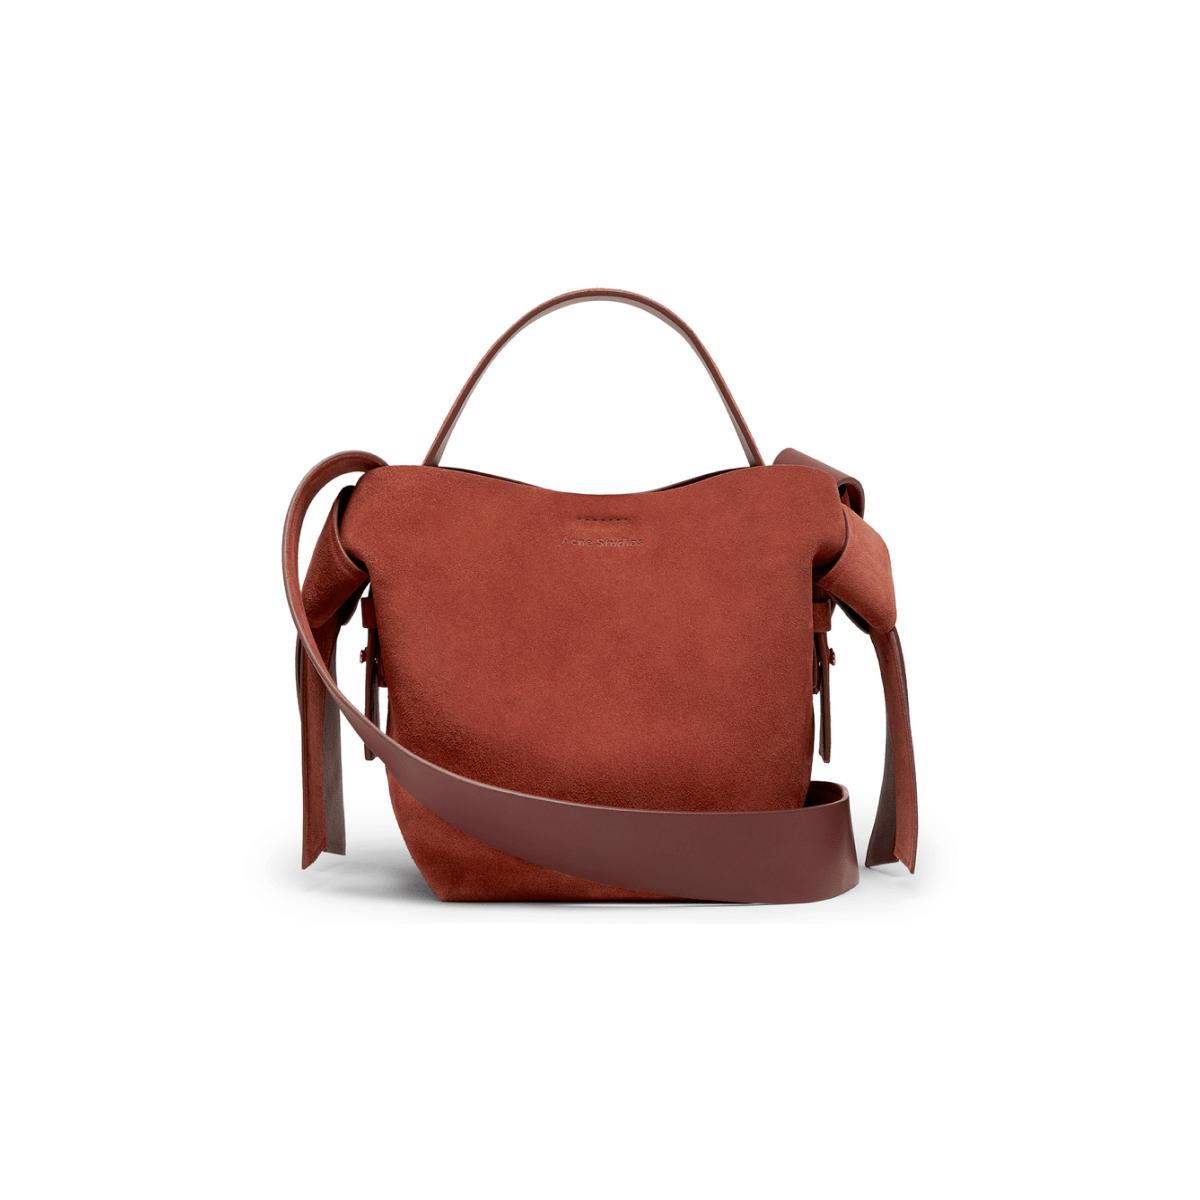 acne studios handbag